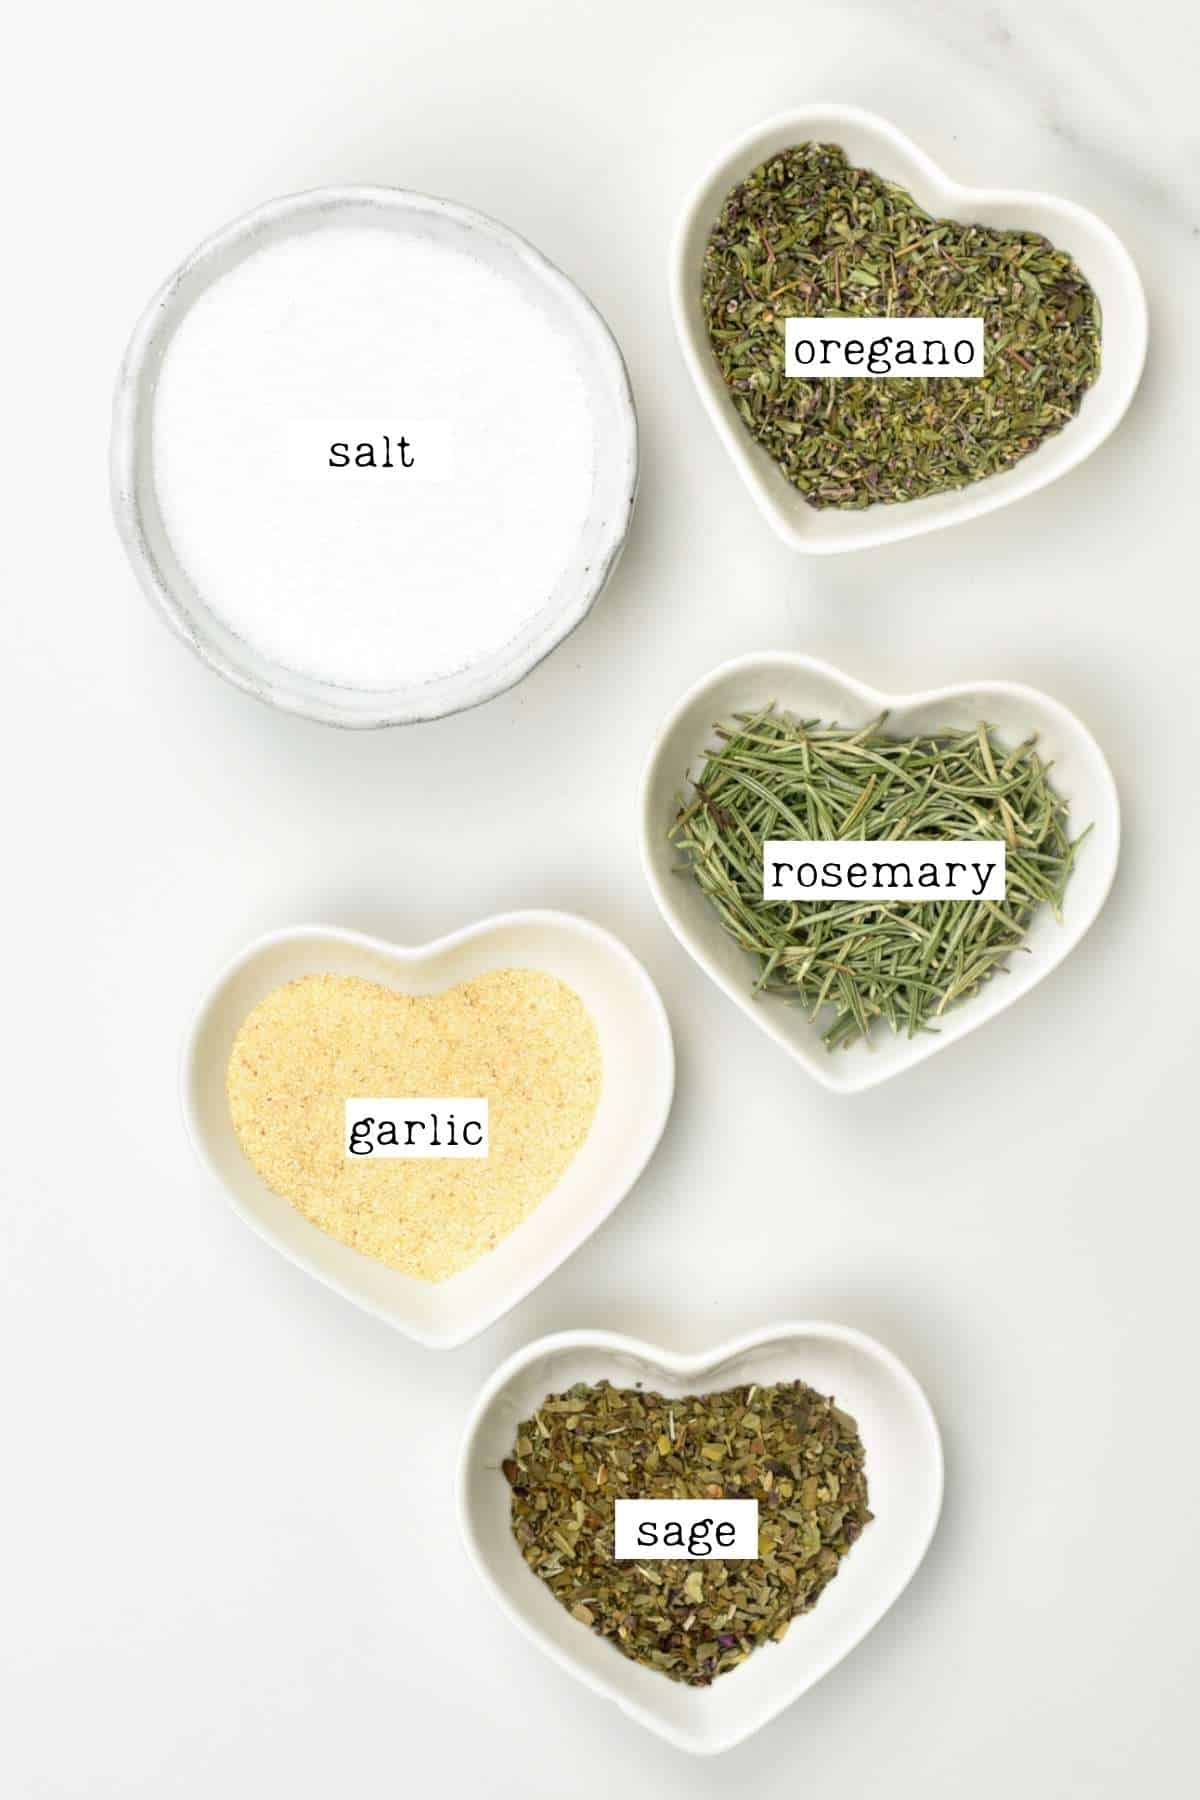 Ingredients for herb salt